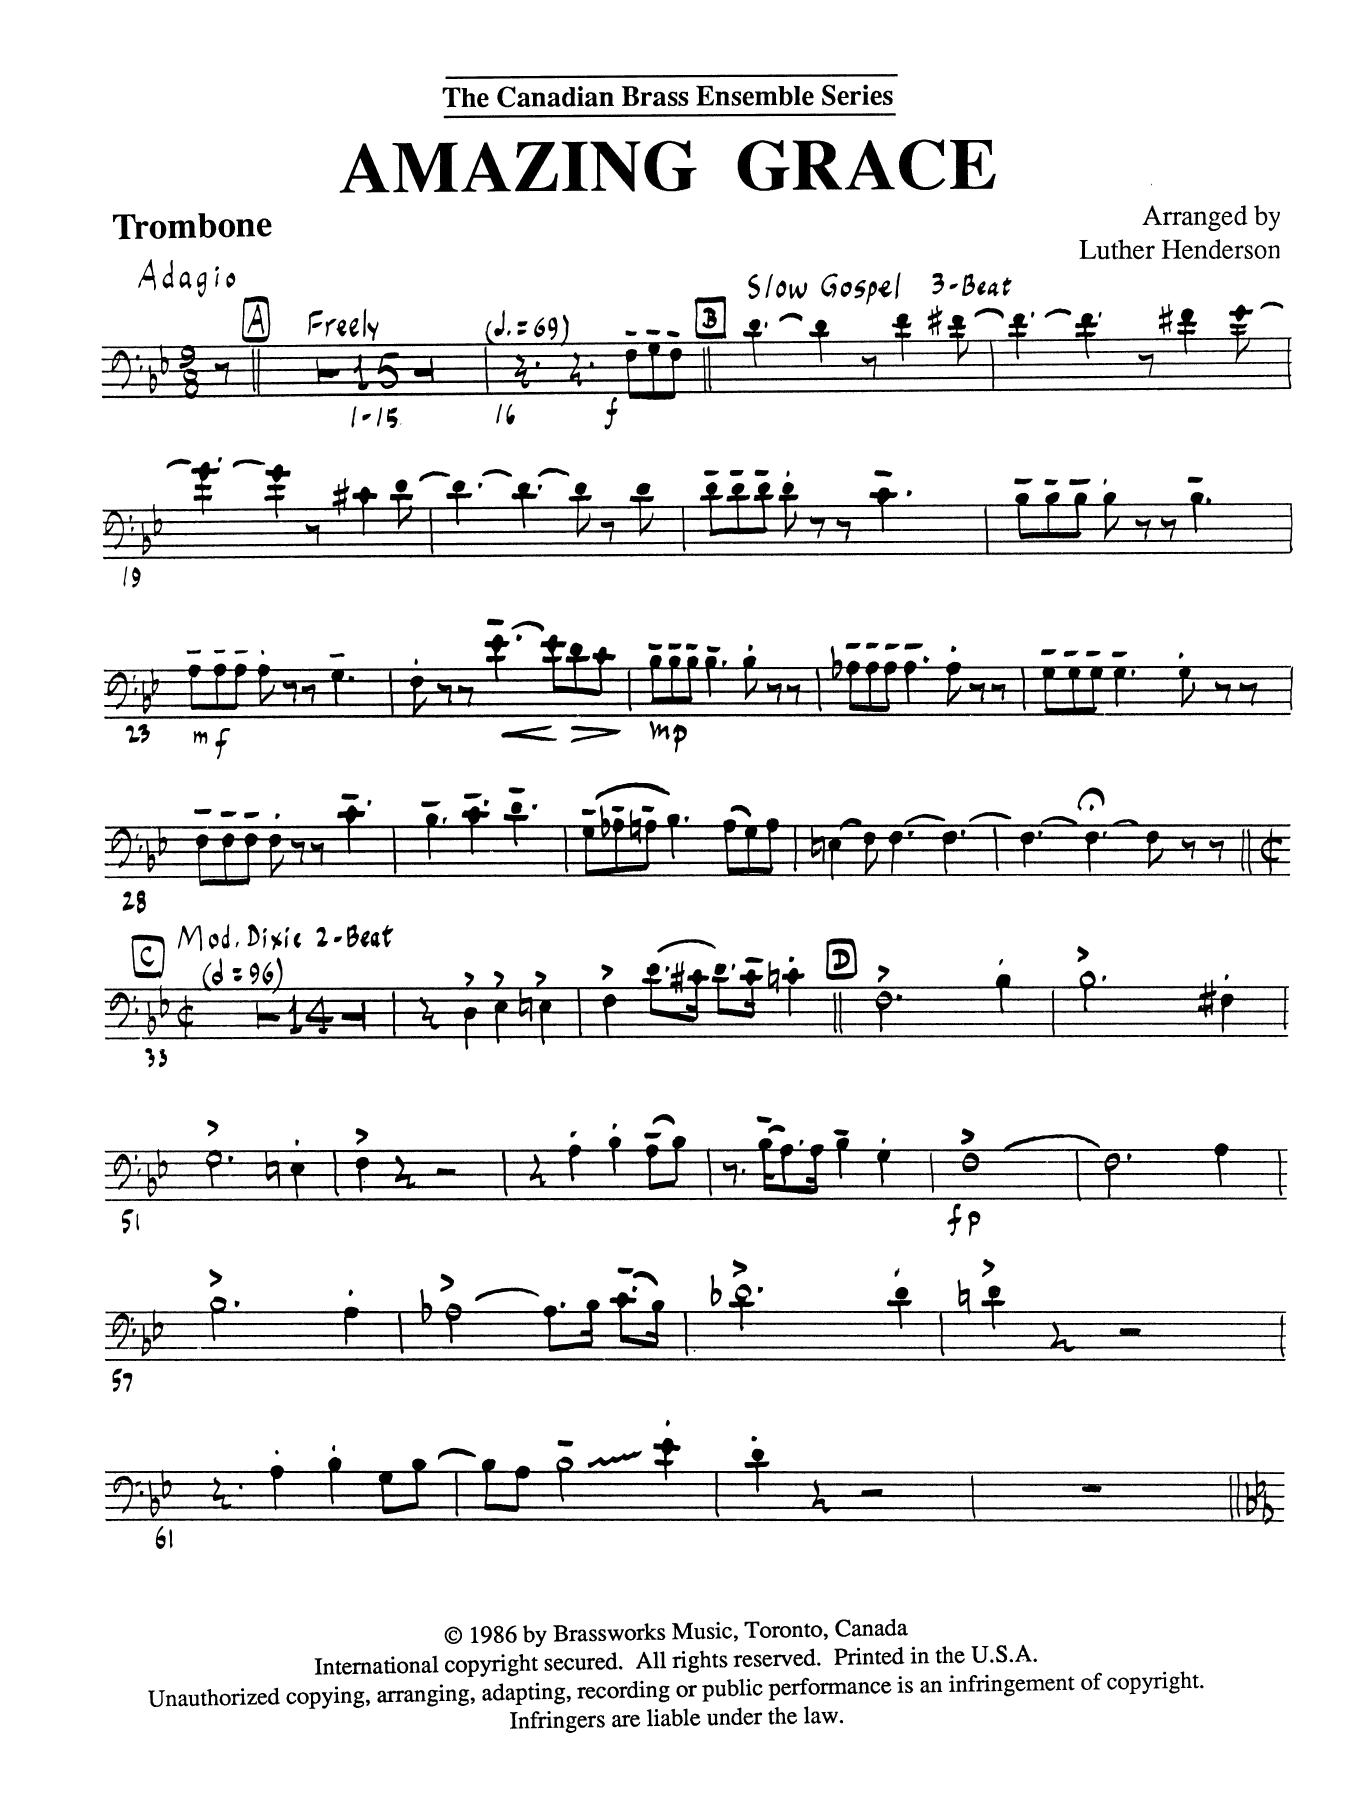 Amazing Grace - Trombone (B.C.)